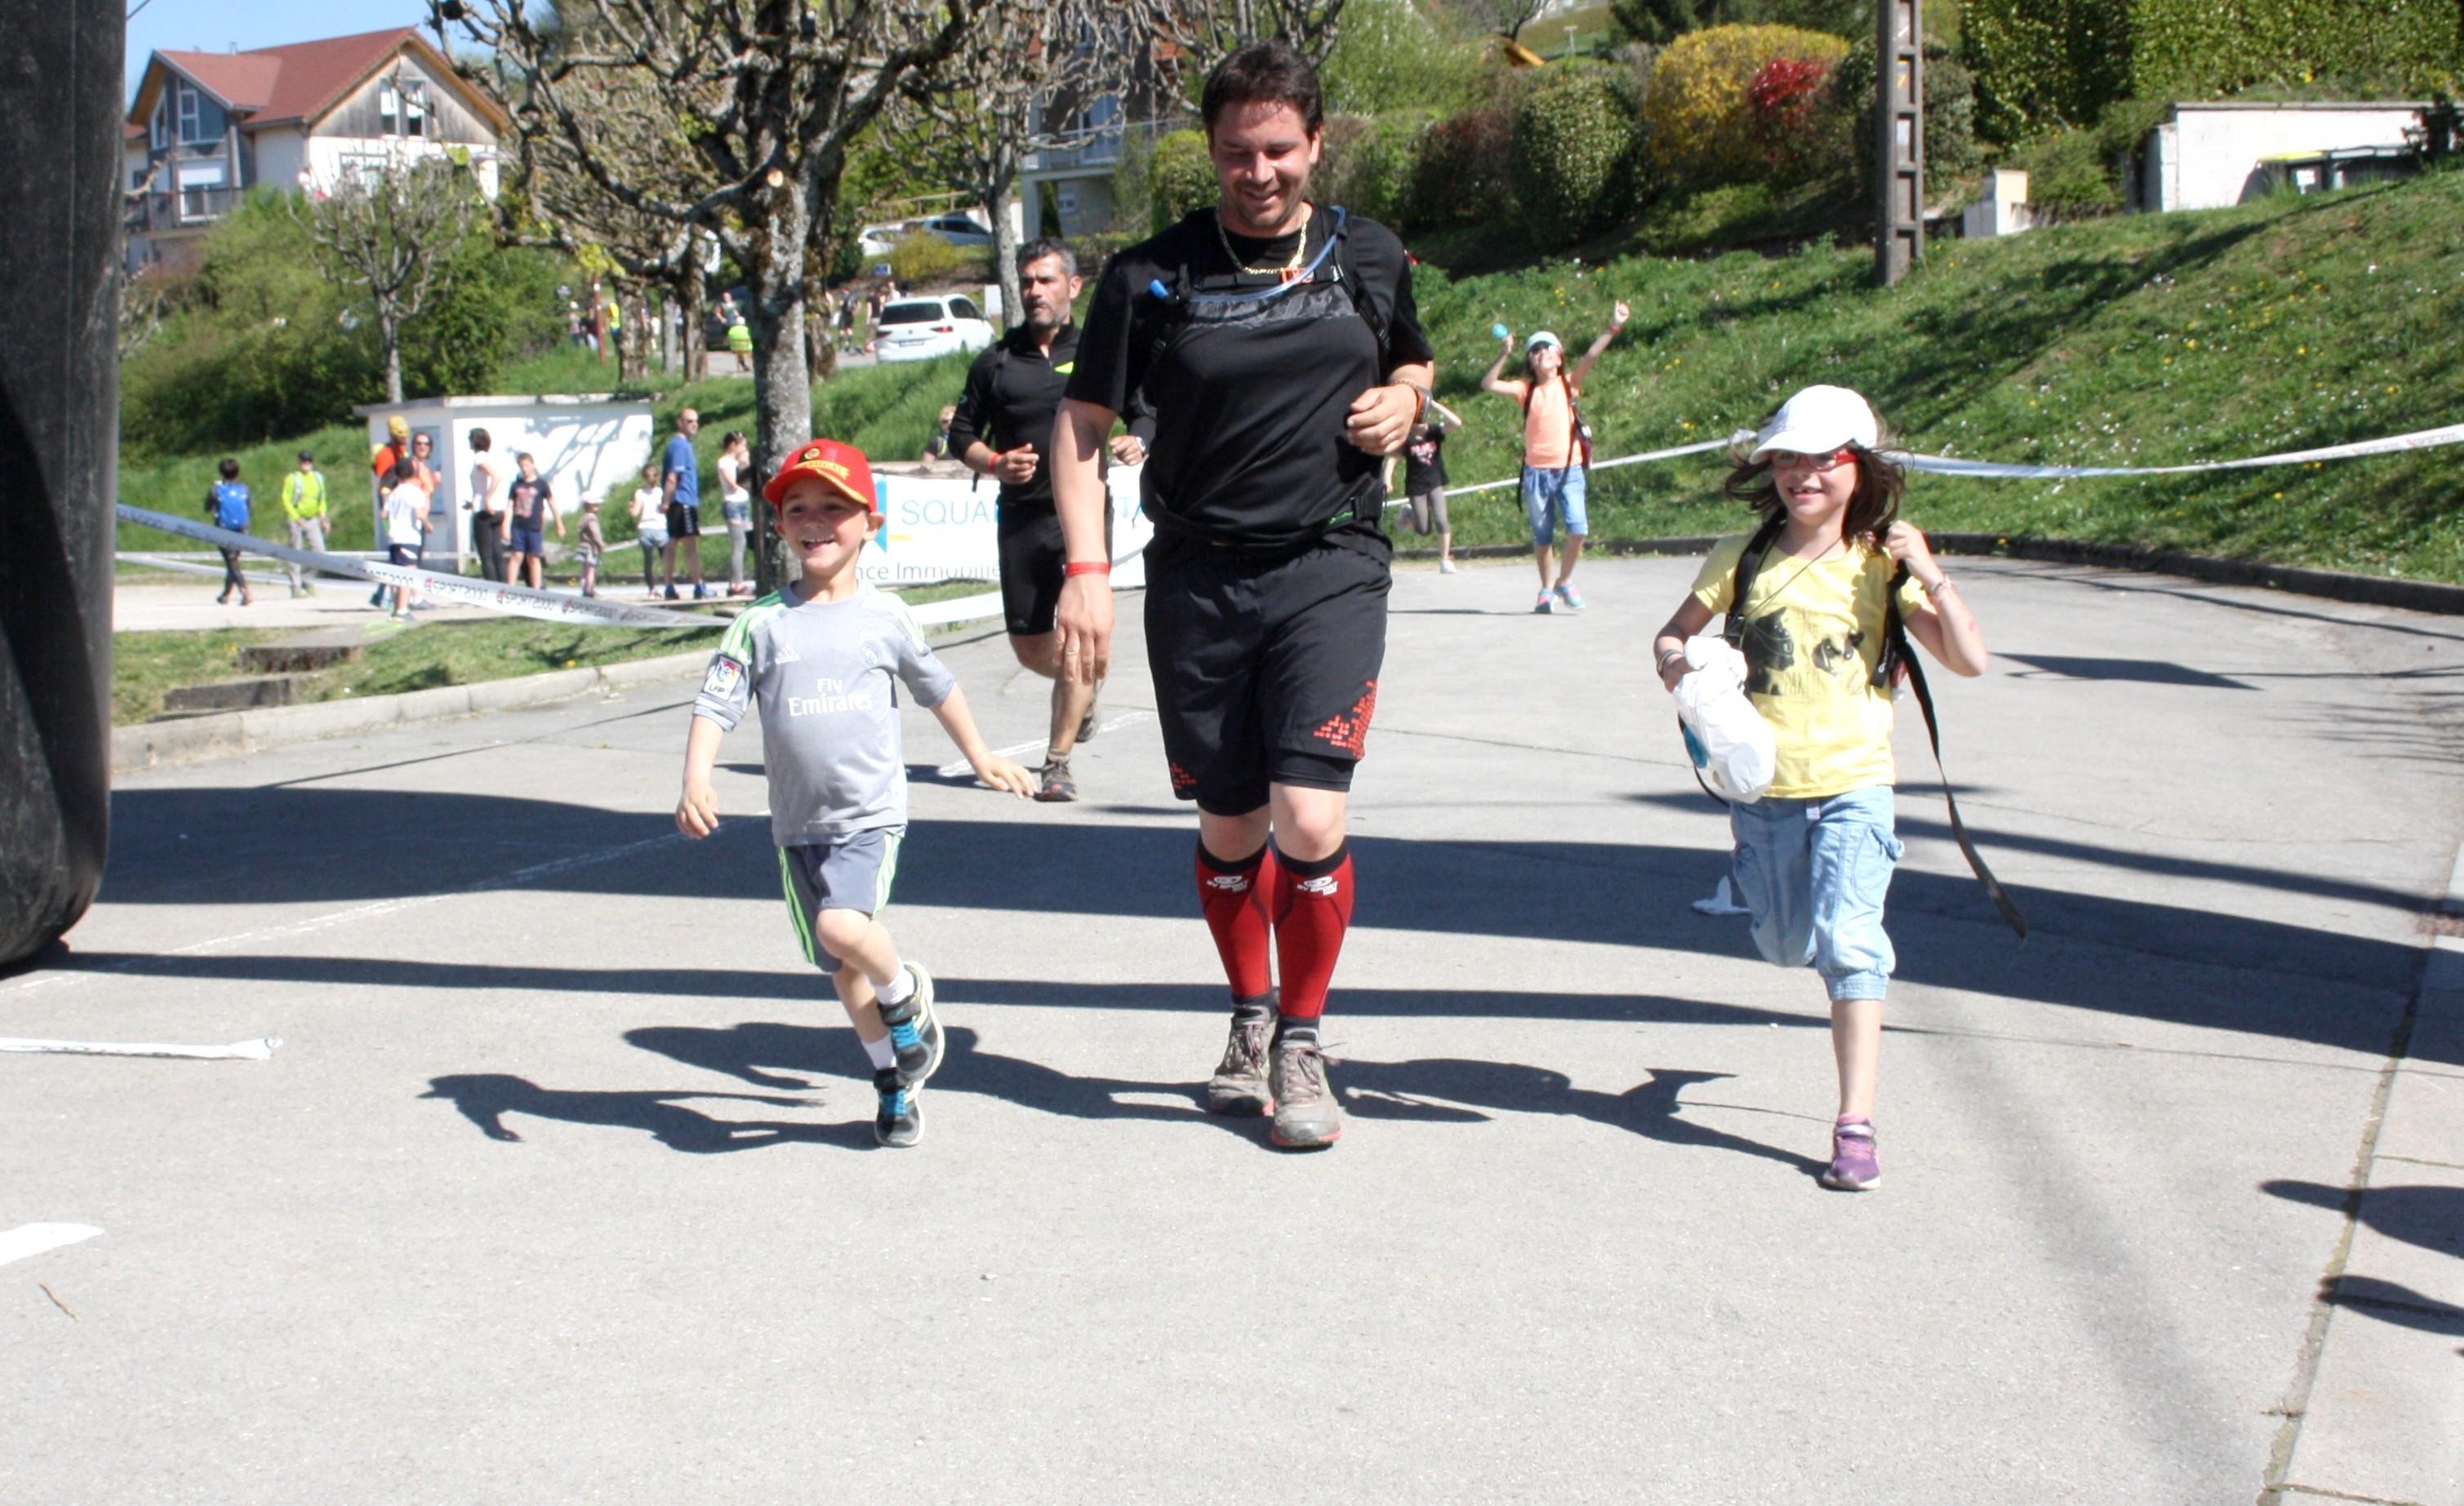 2017-04-09 - Trail-Montfaucon (358)